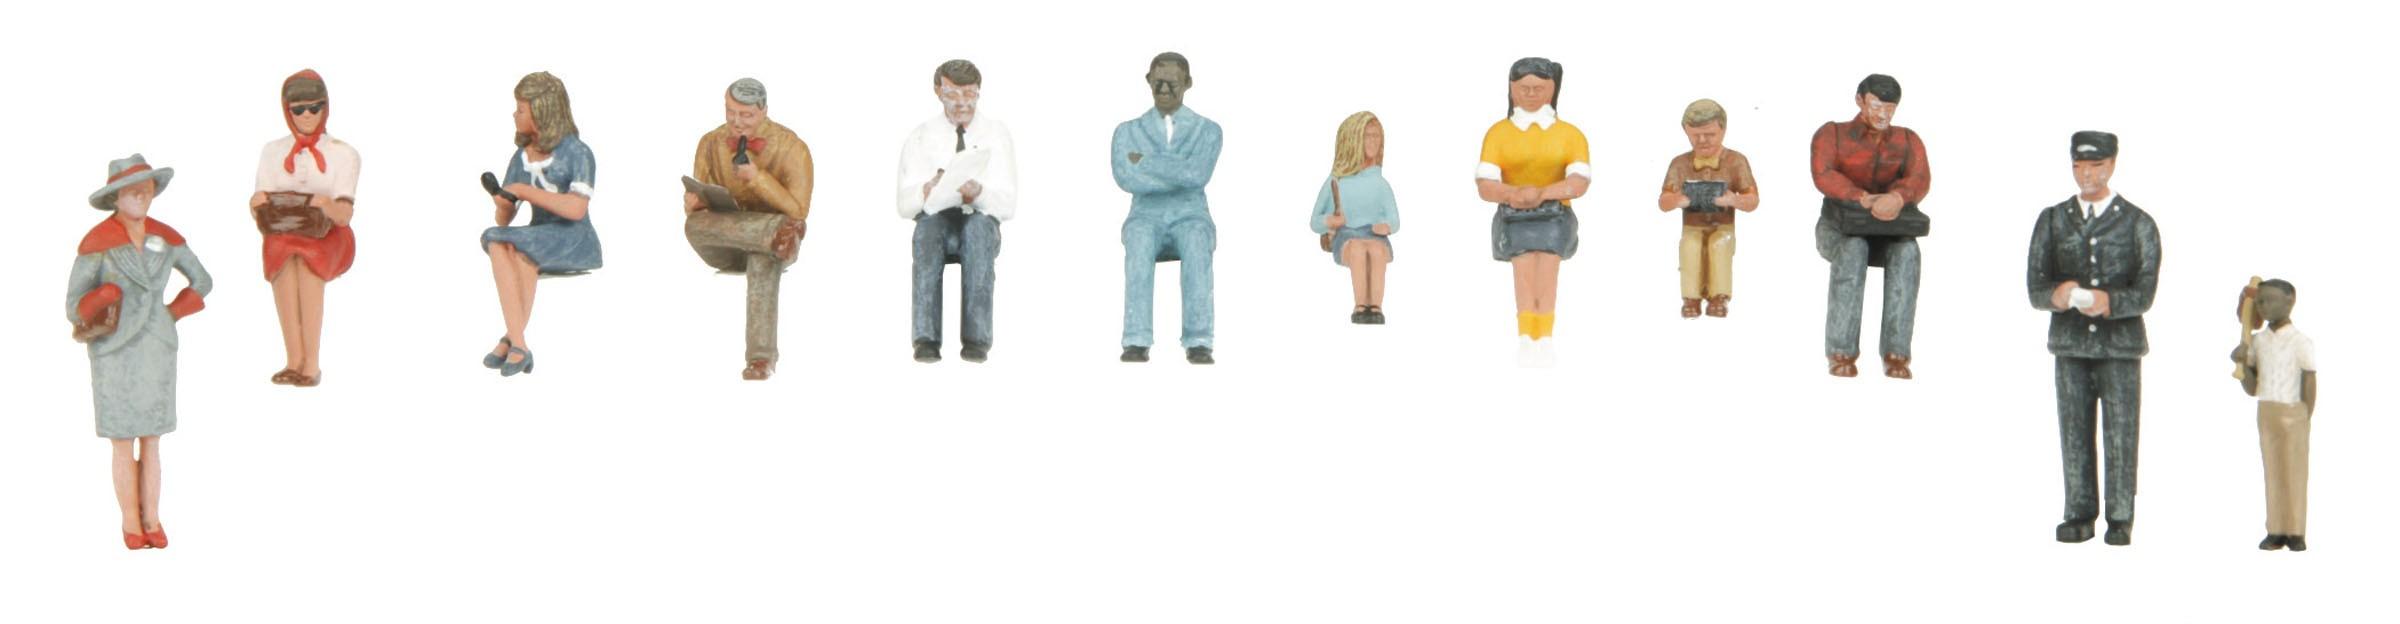 30-11068  Passenger Figure Set #4 - 12 pc